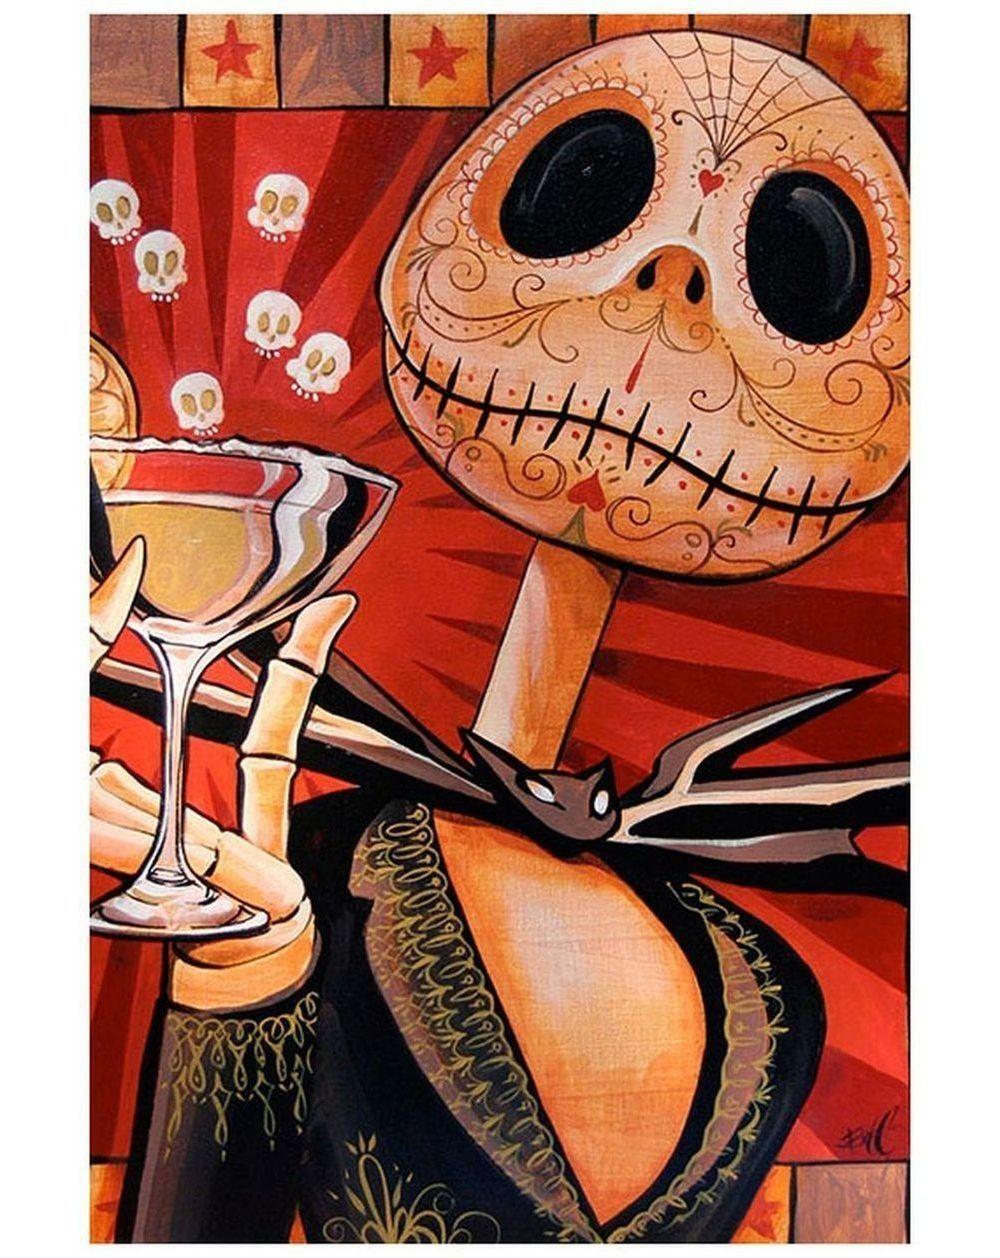 "Jack Celebrates The Dead::Día de los Skellington! 12x18"" Print by artiste Mike Bell.. ."